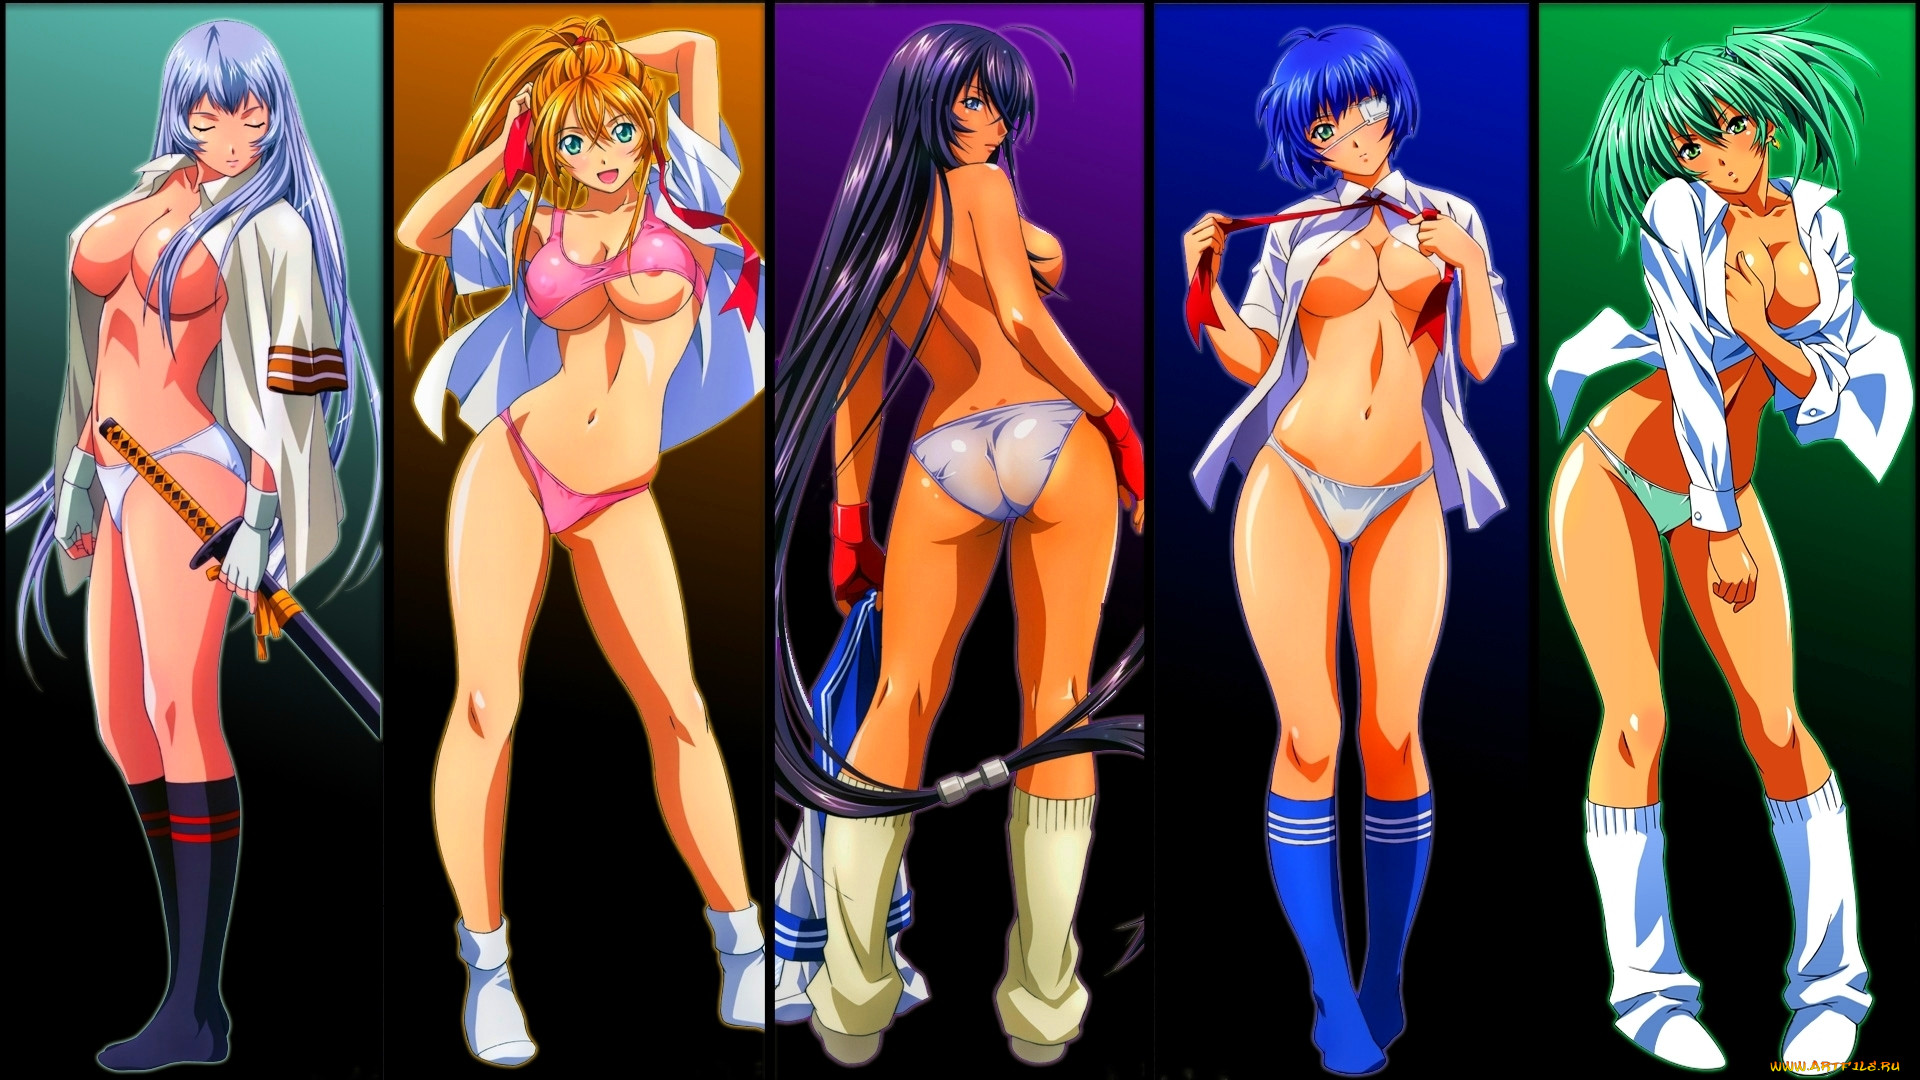 Ikkitousen hd nude anime clips